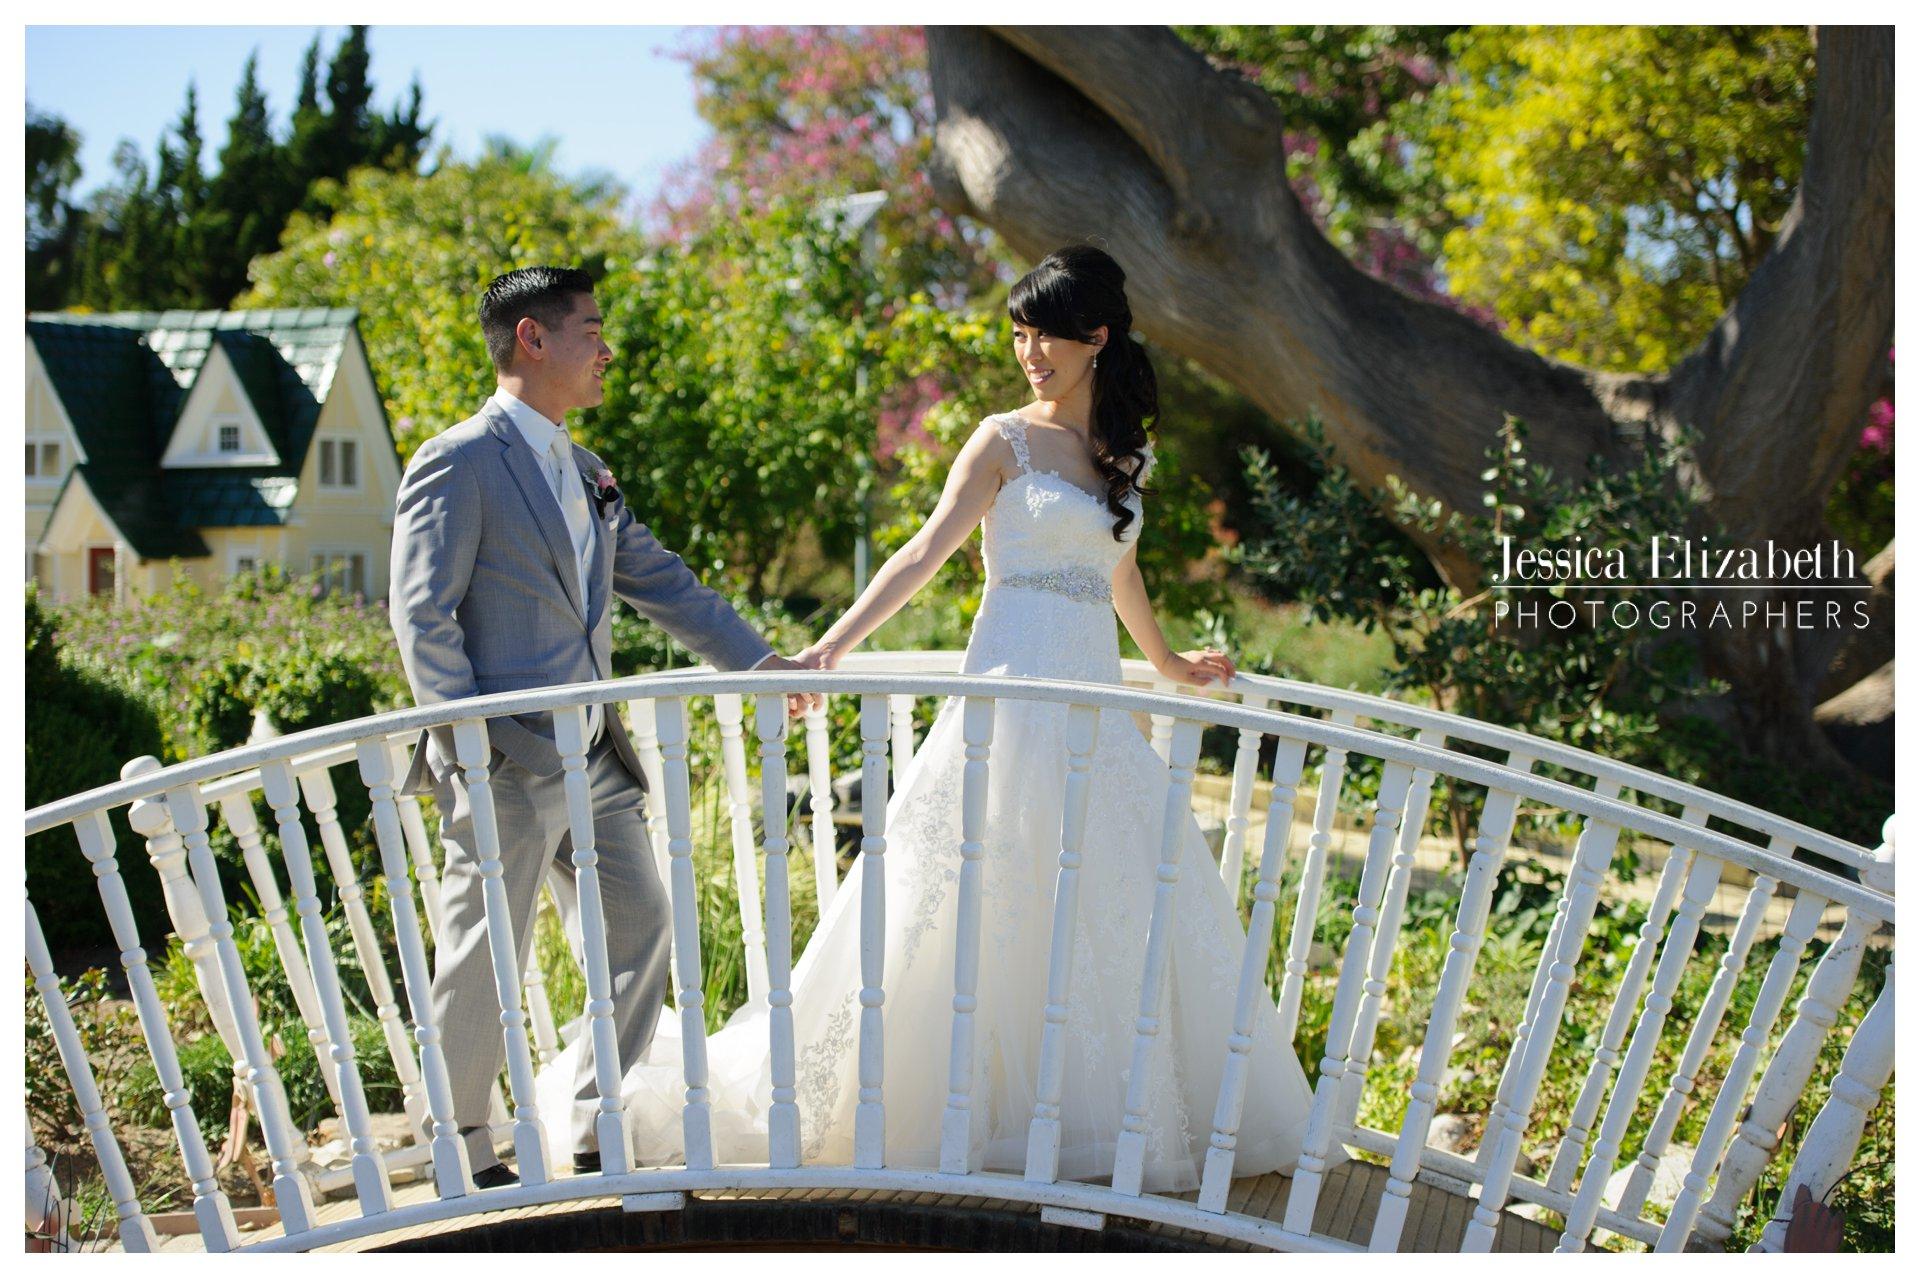 12-South Coast Botanic Garden Palos Verdes Wedding Photography by Jessica Elizabeth